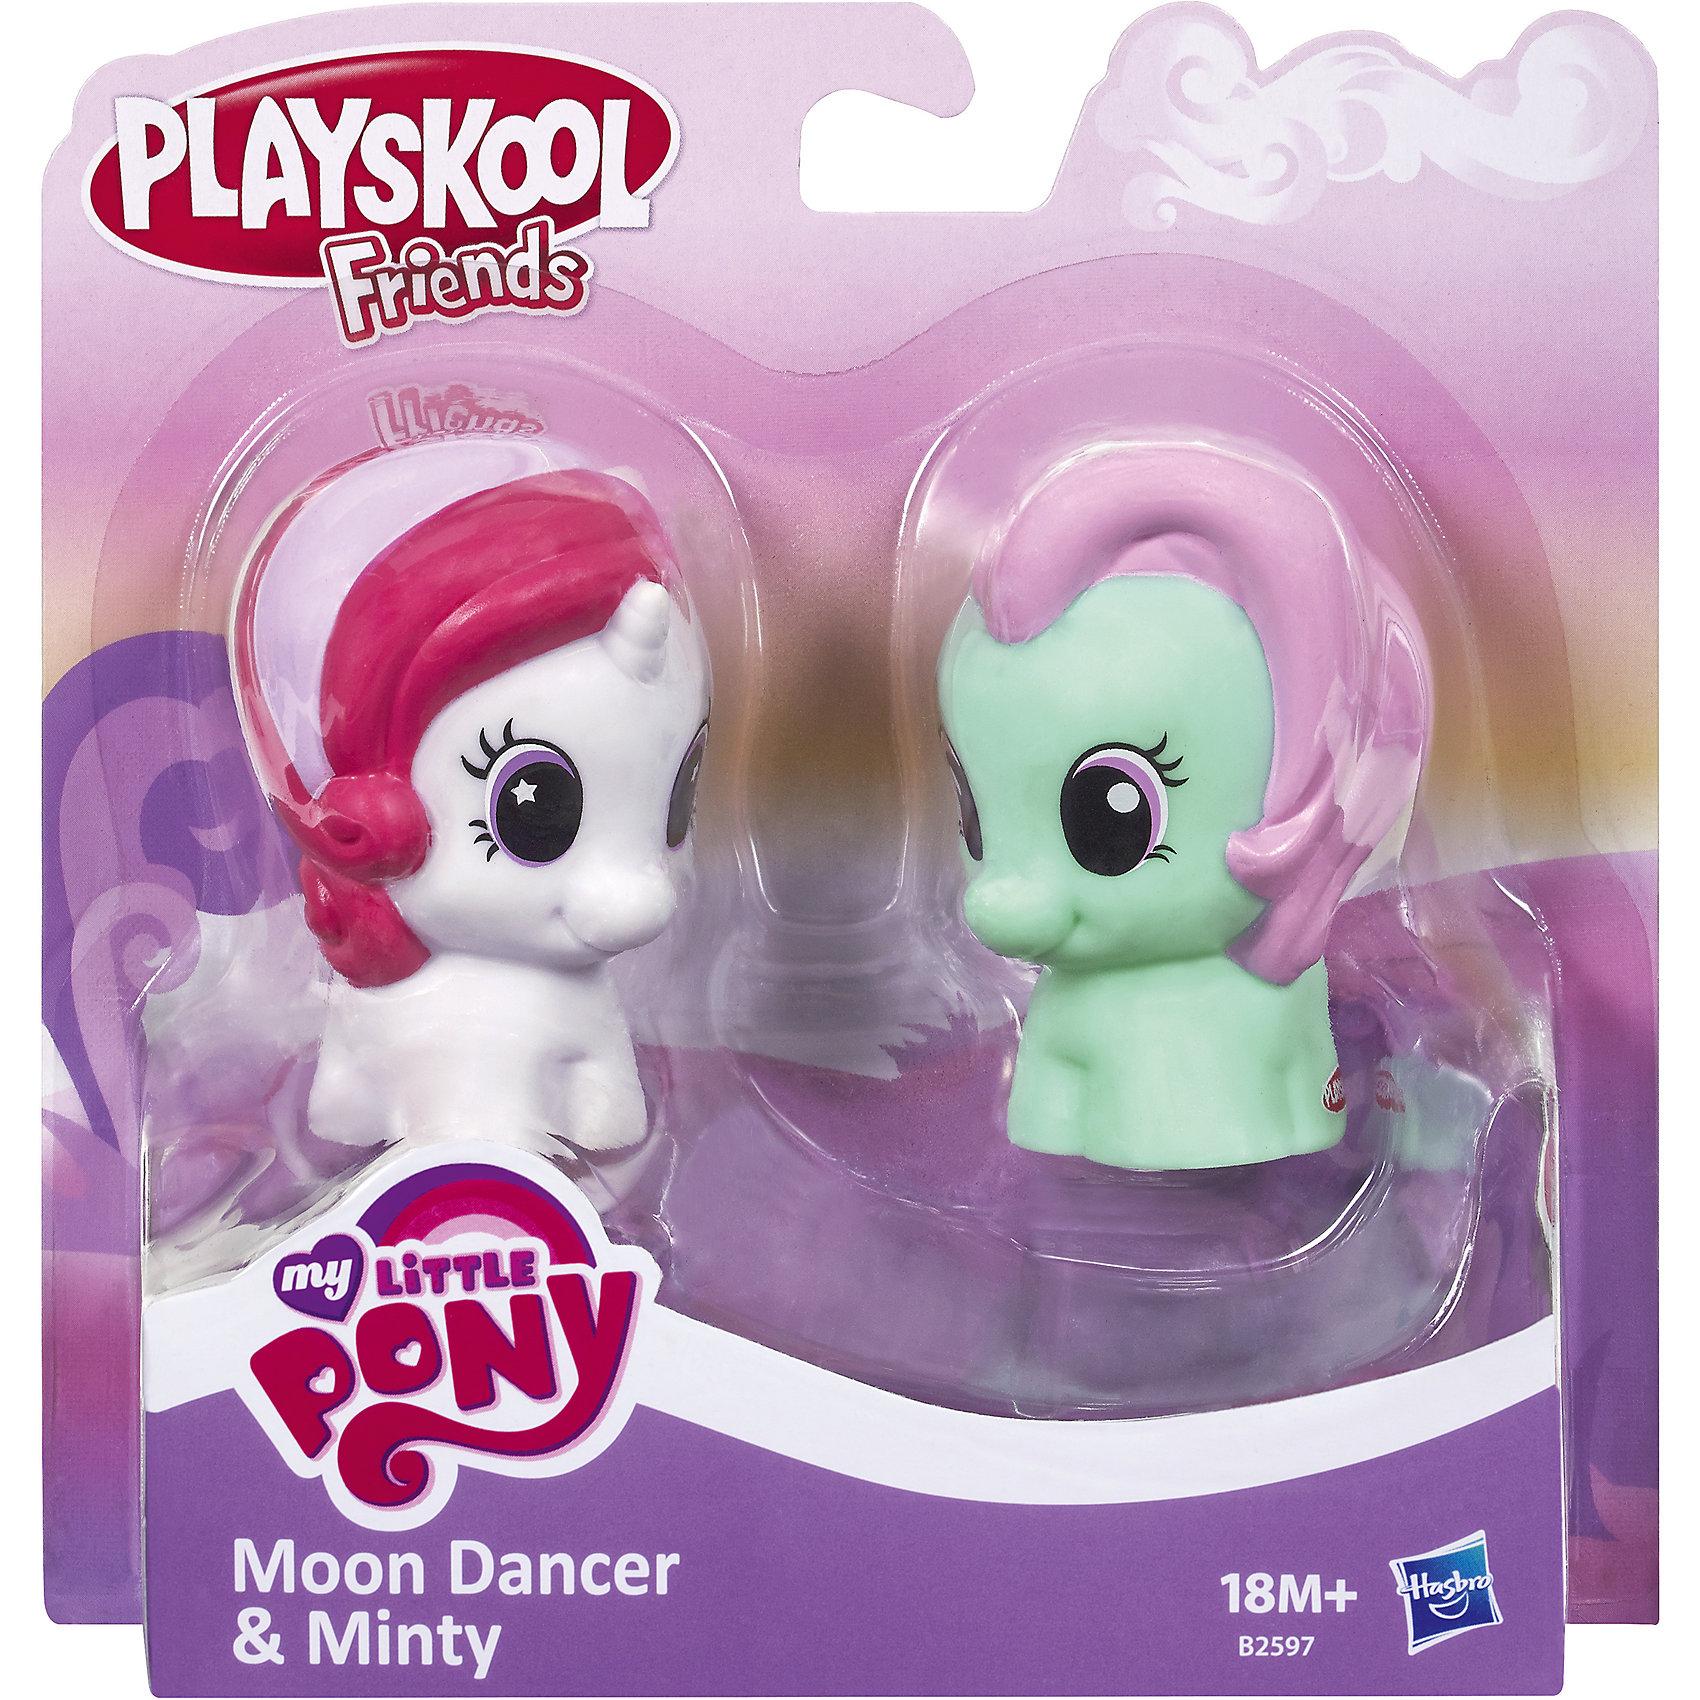 ����-�������, My little Pony, PLAYSKOOL (Hasbro)